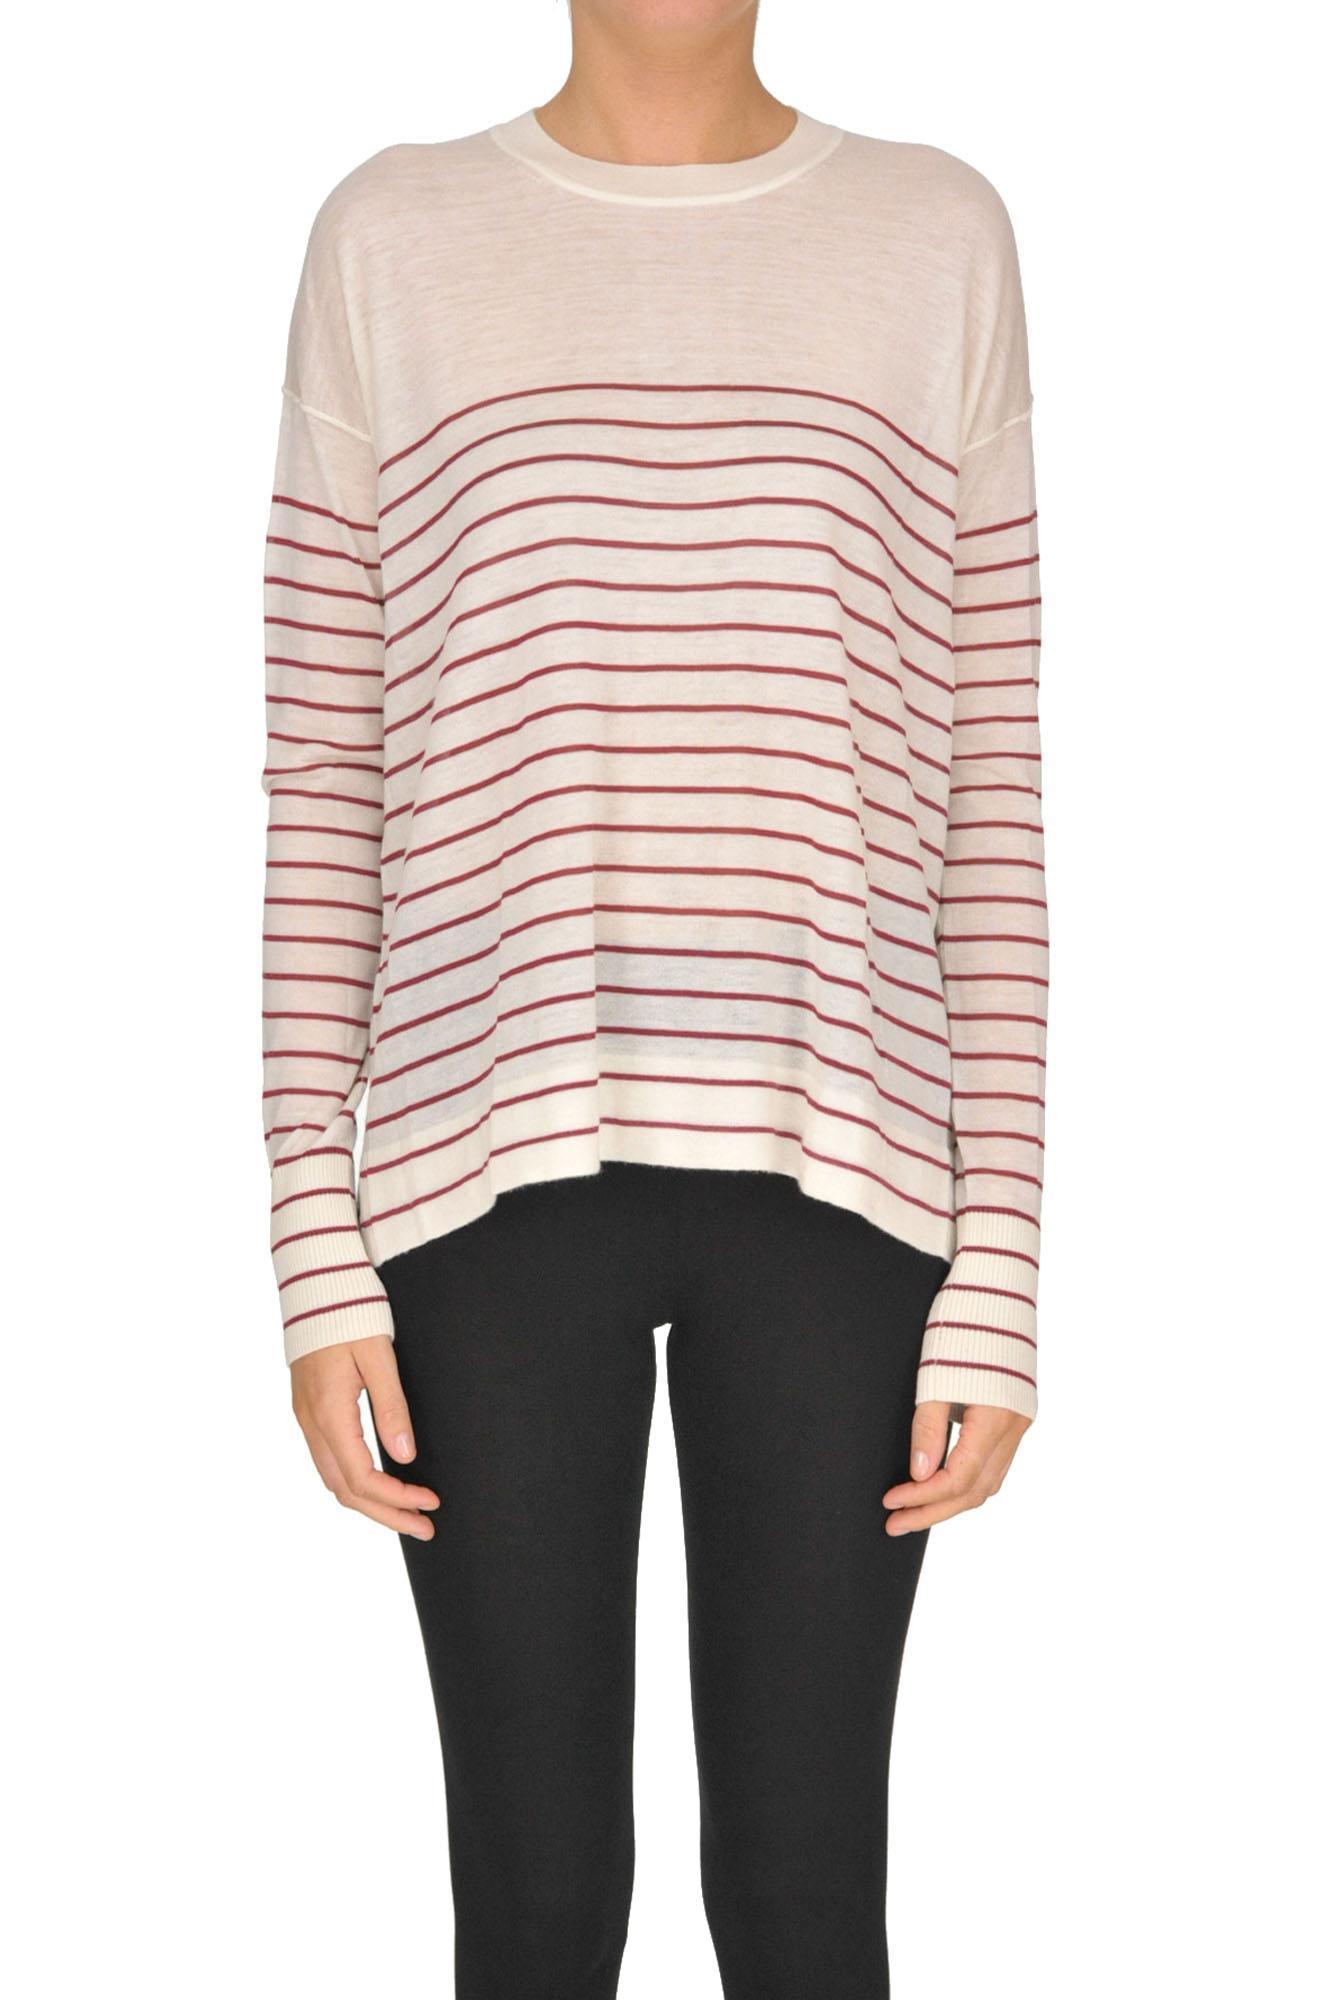 In Striped Red Forte Cashmere Pullover Lyst iuTOPZkX